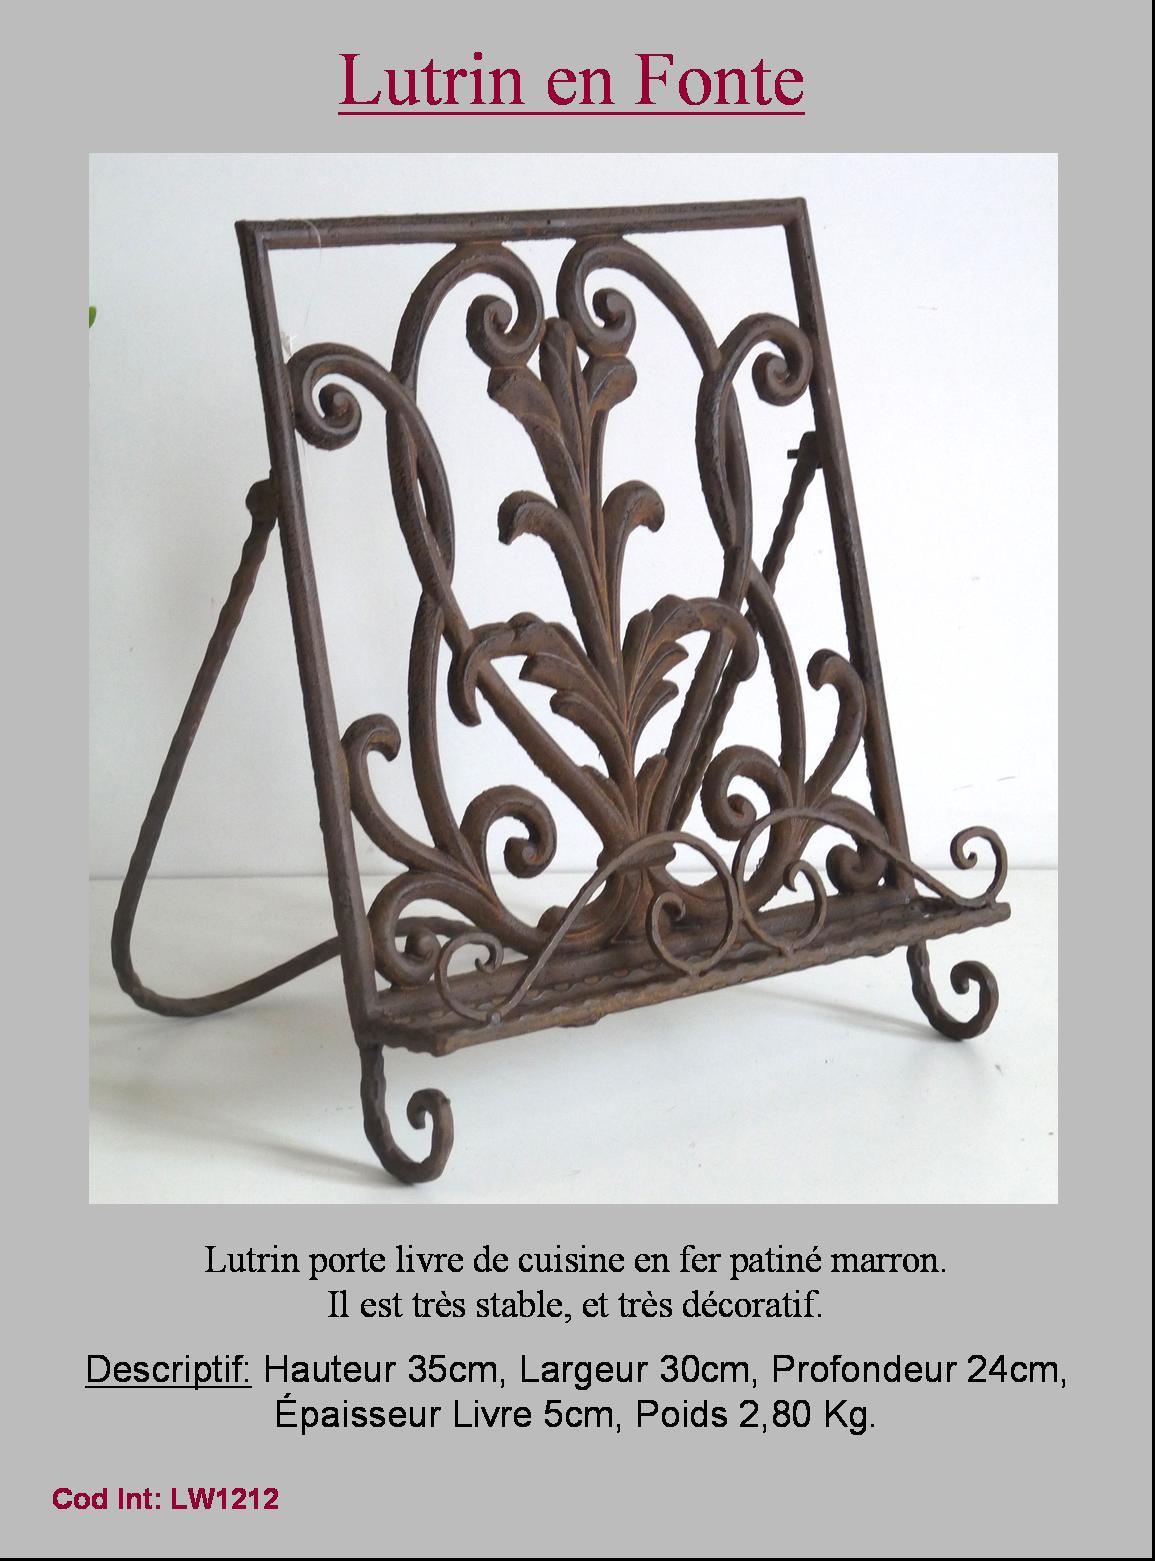 porte livre lutrin chevalet pupitre de lecture cuisine ebay. Black Bedroom Furniture Sets. Home Design Ideas